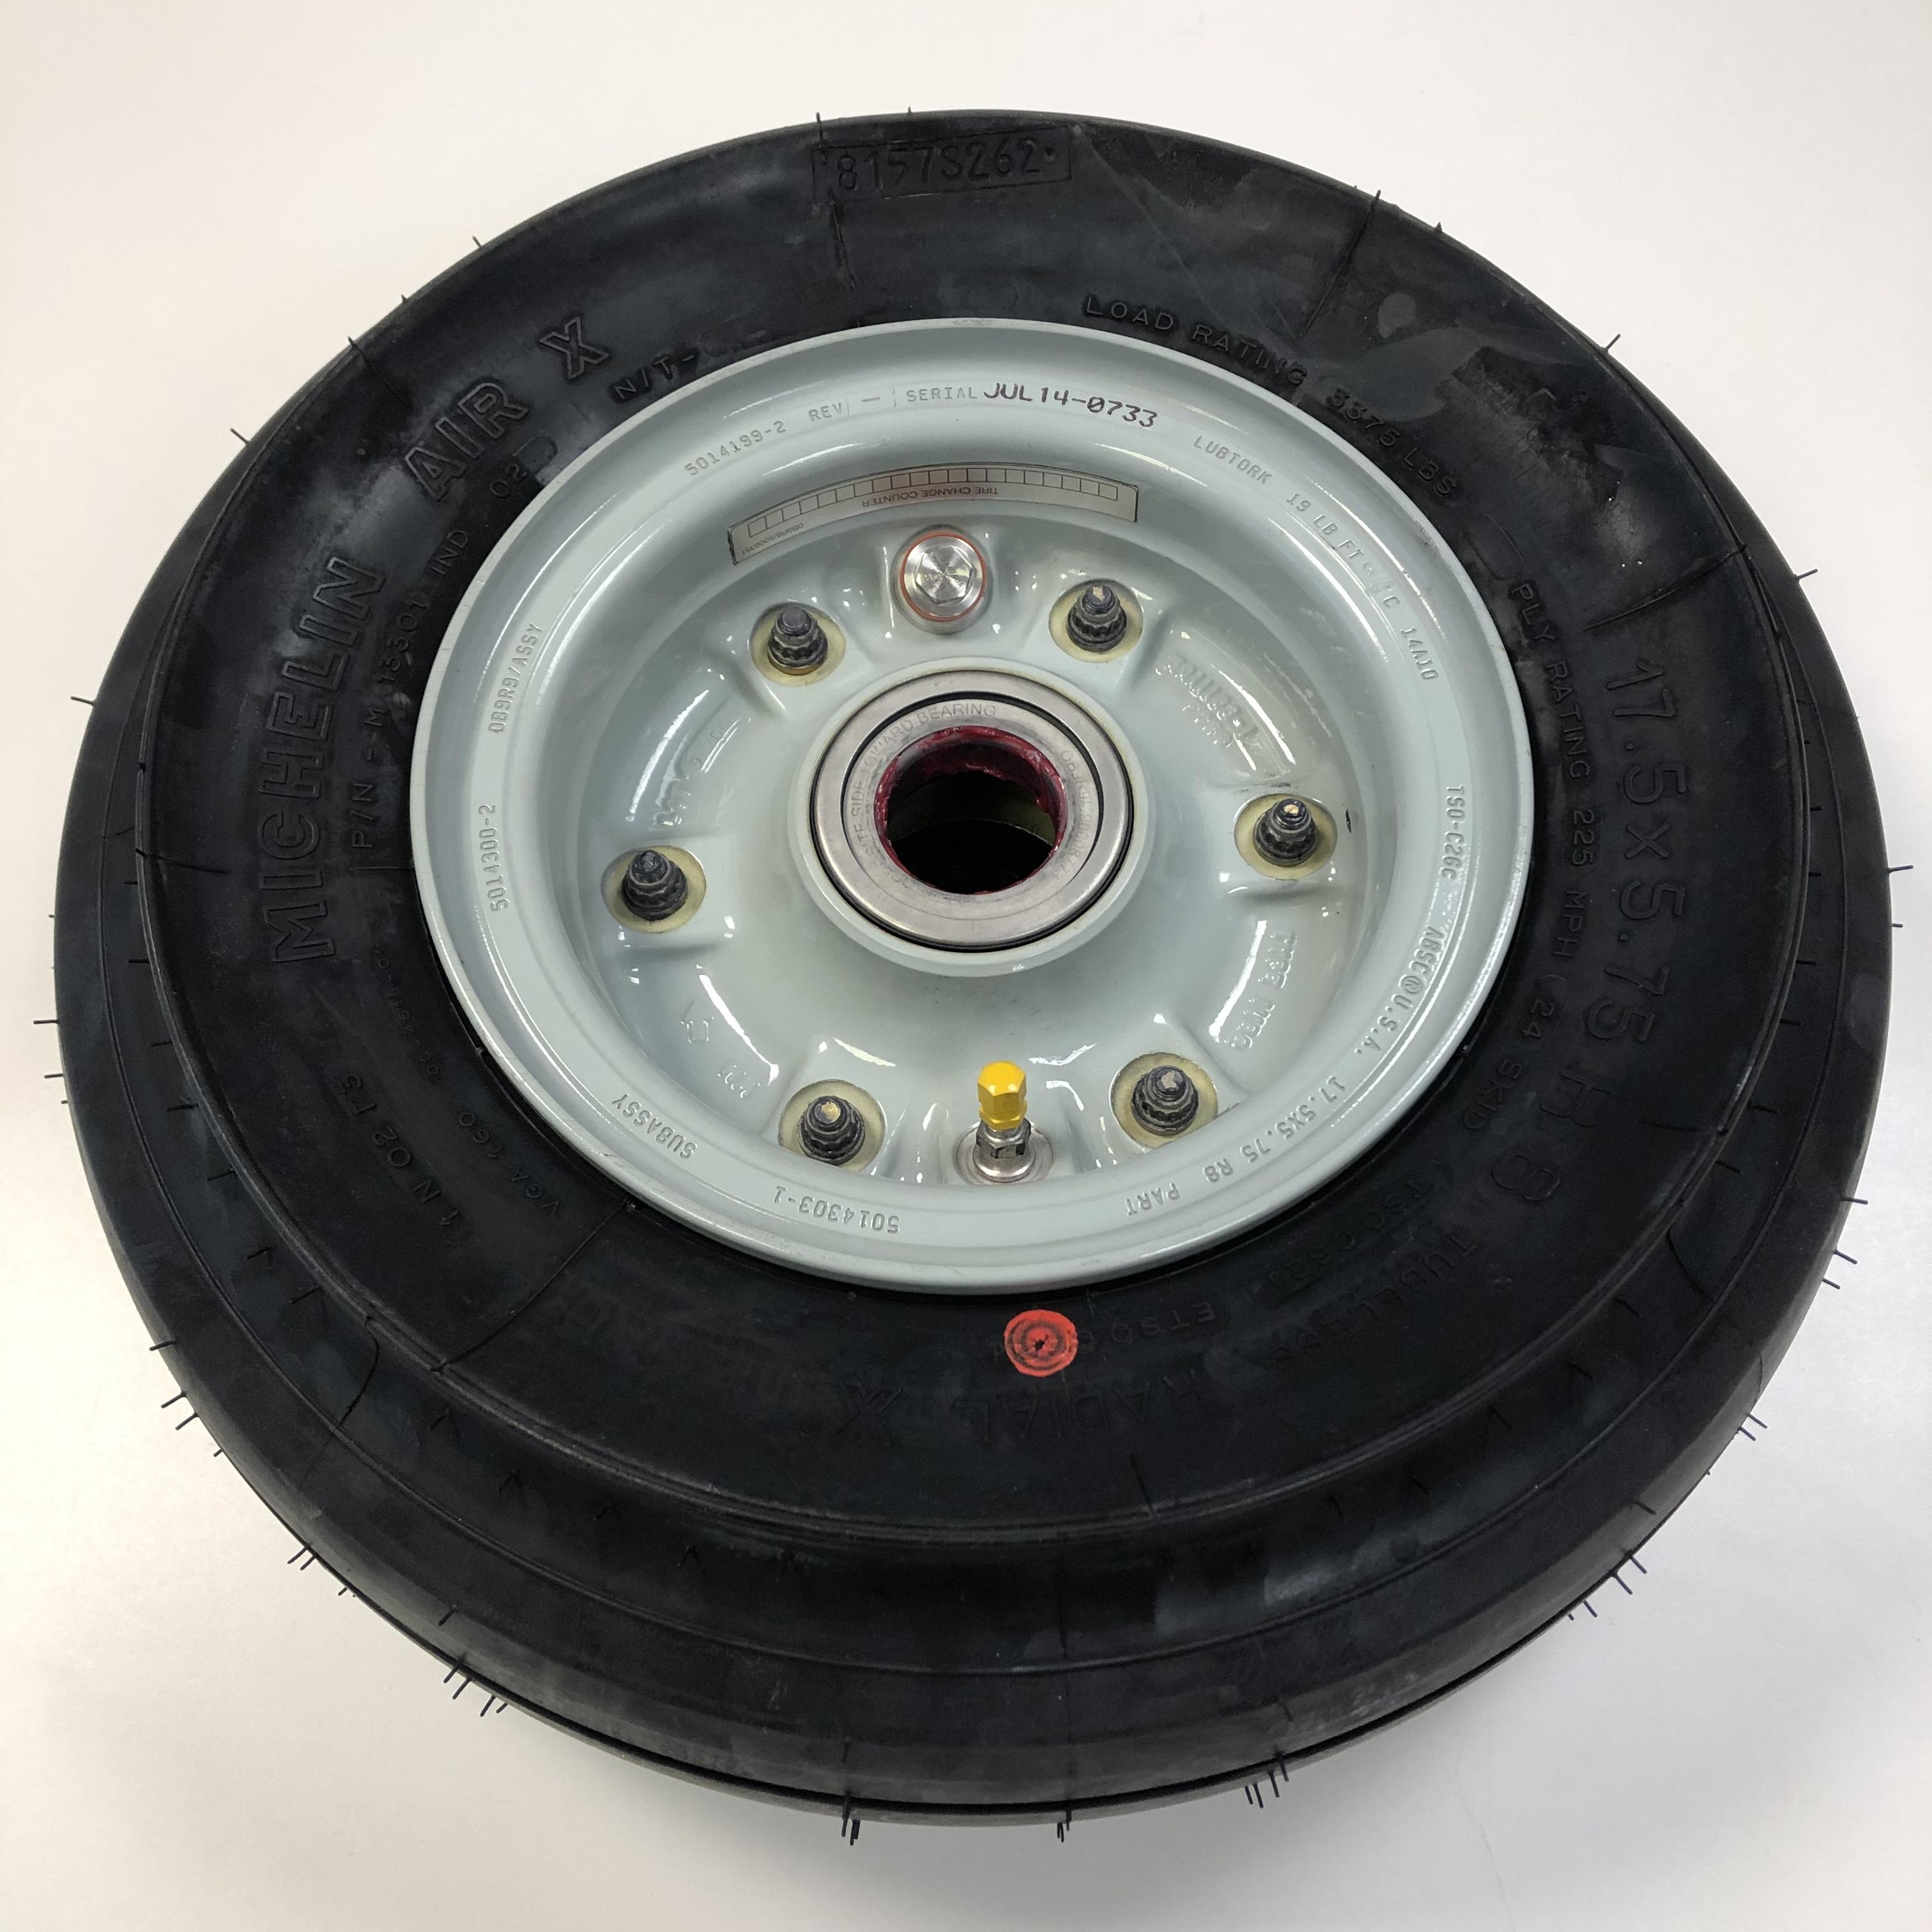 5014199 Dassault Falcon wheel